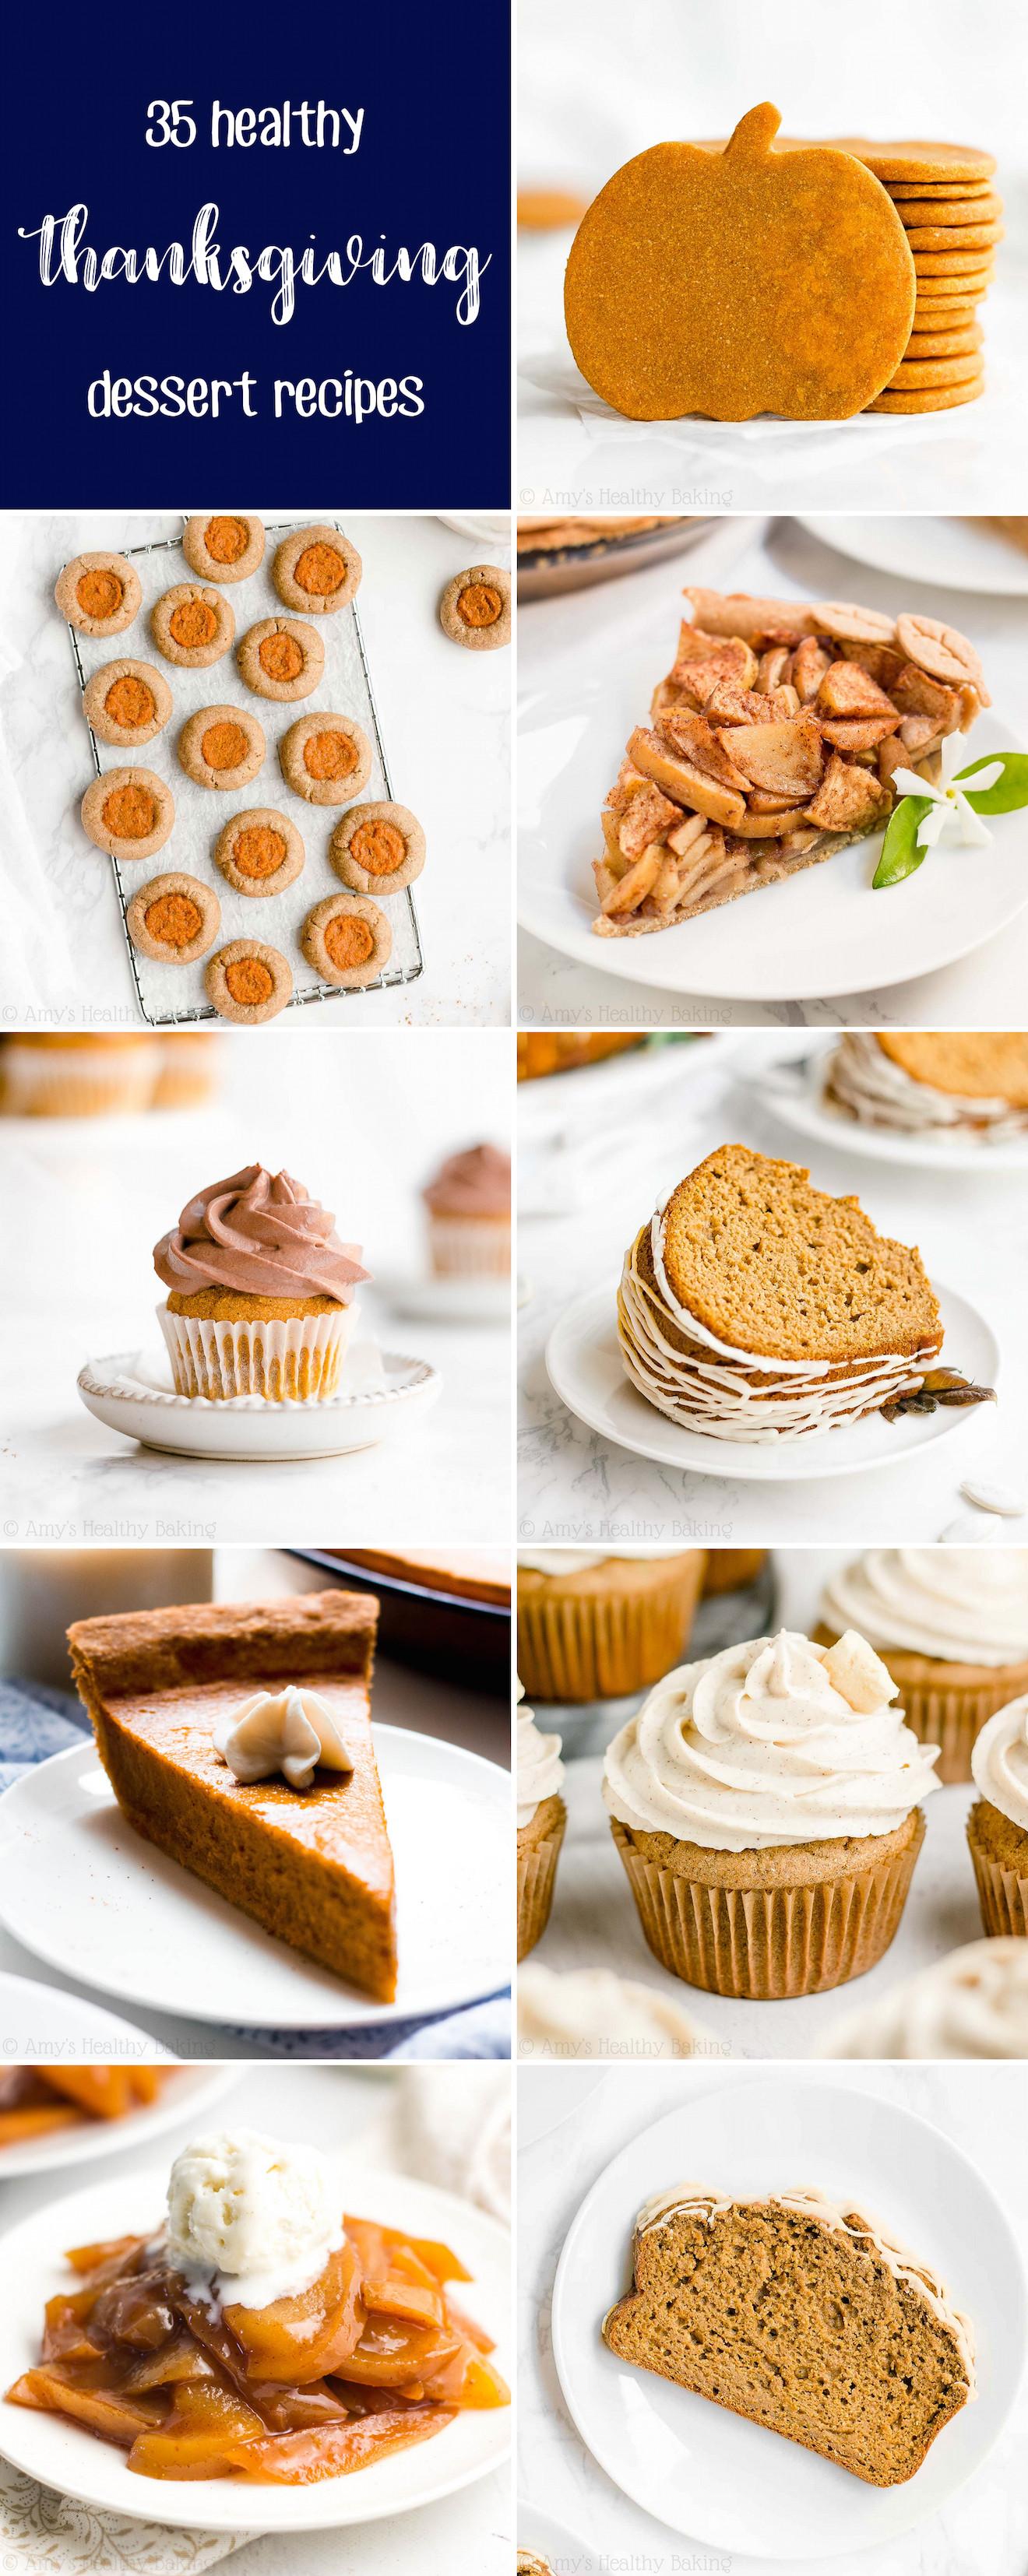 Low Calorie Thanksgiving Desserts  35 Healthy Thanksgiving Dessert Recipes